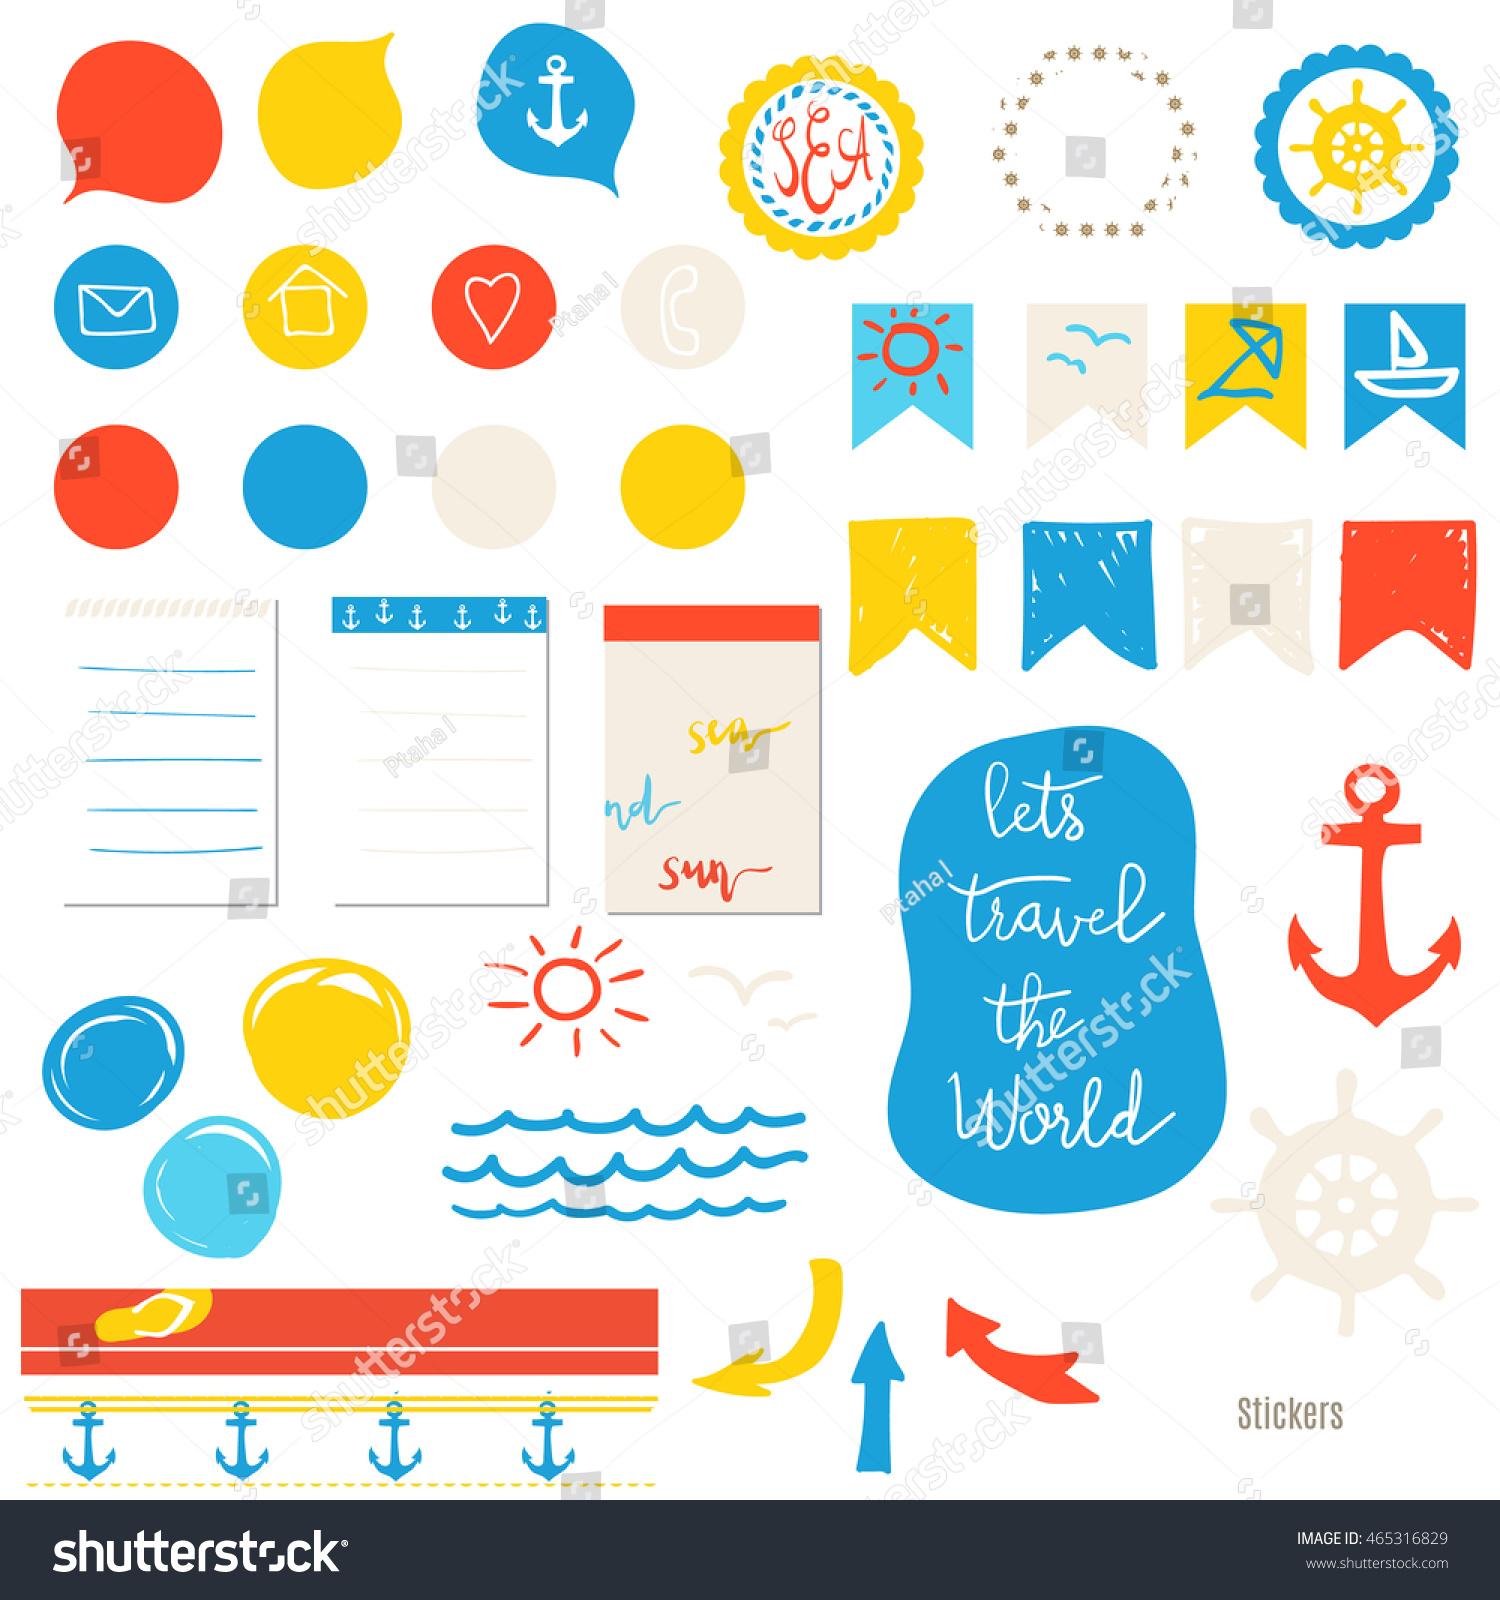 Elements Design Scrapbooking Cards Blogs Marine Stock Vector